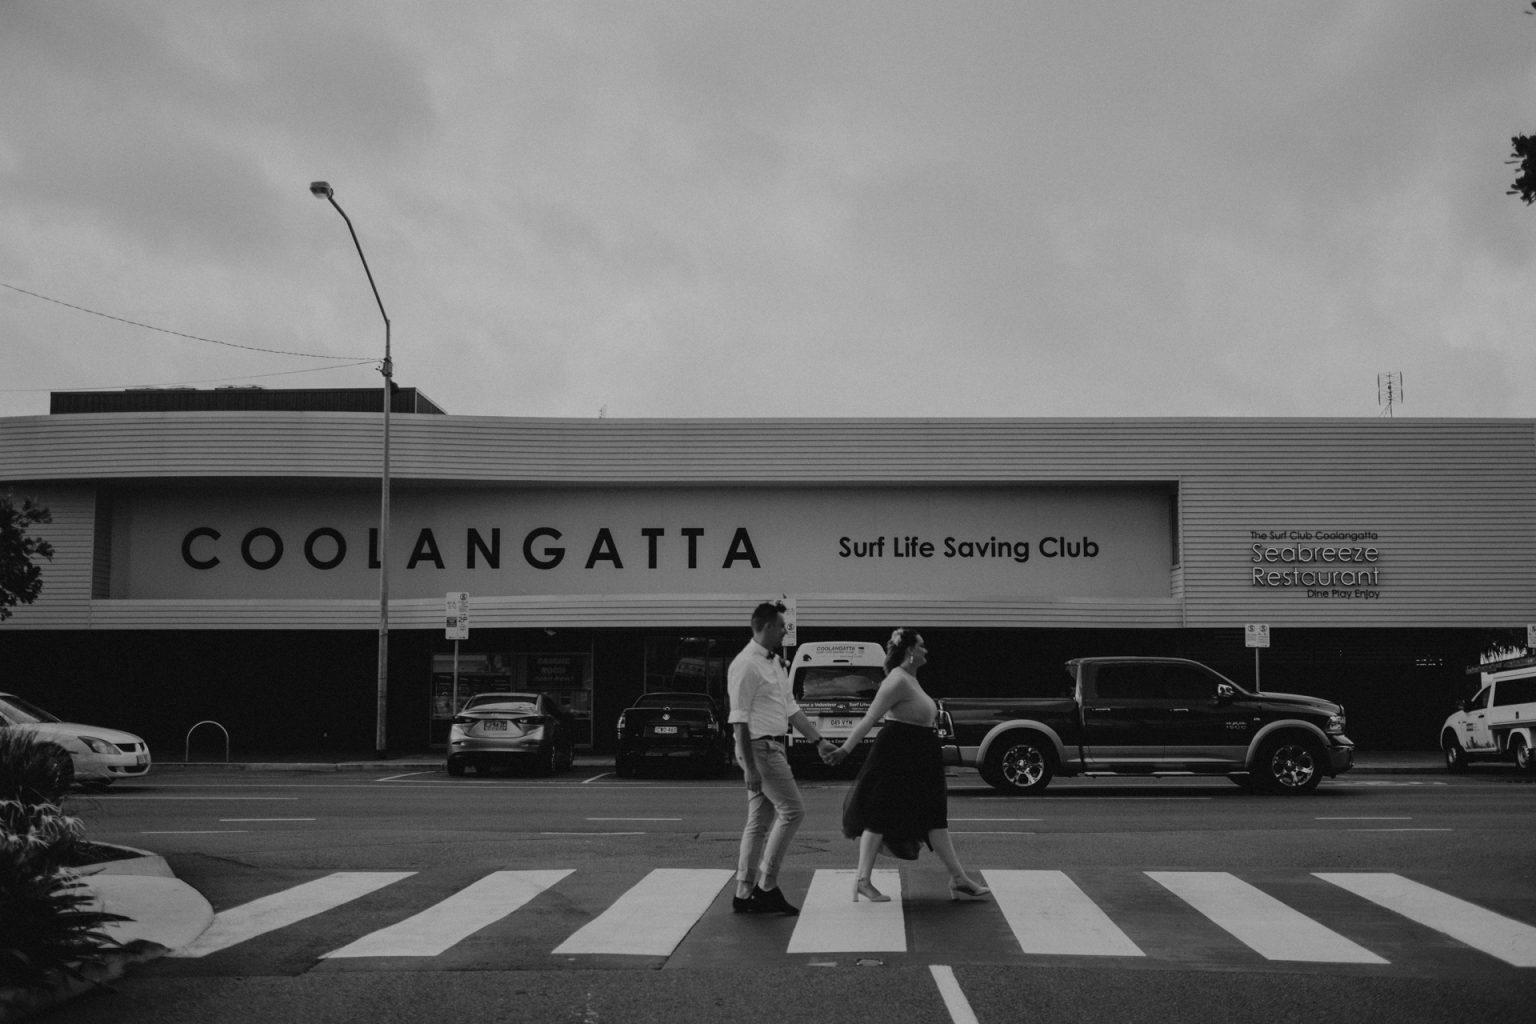 bride and groom coolangatta crosswalk